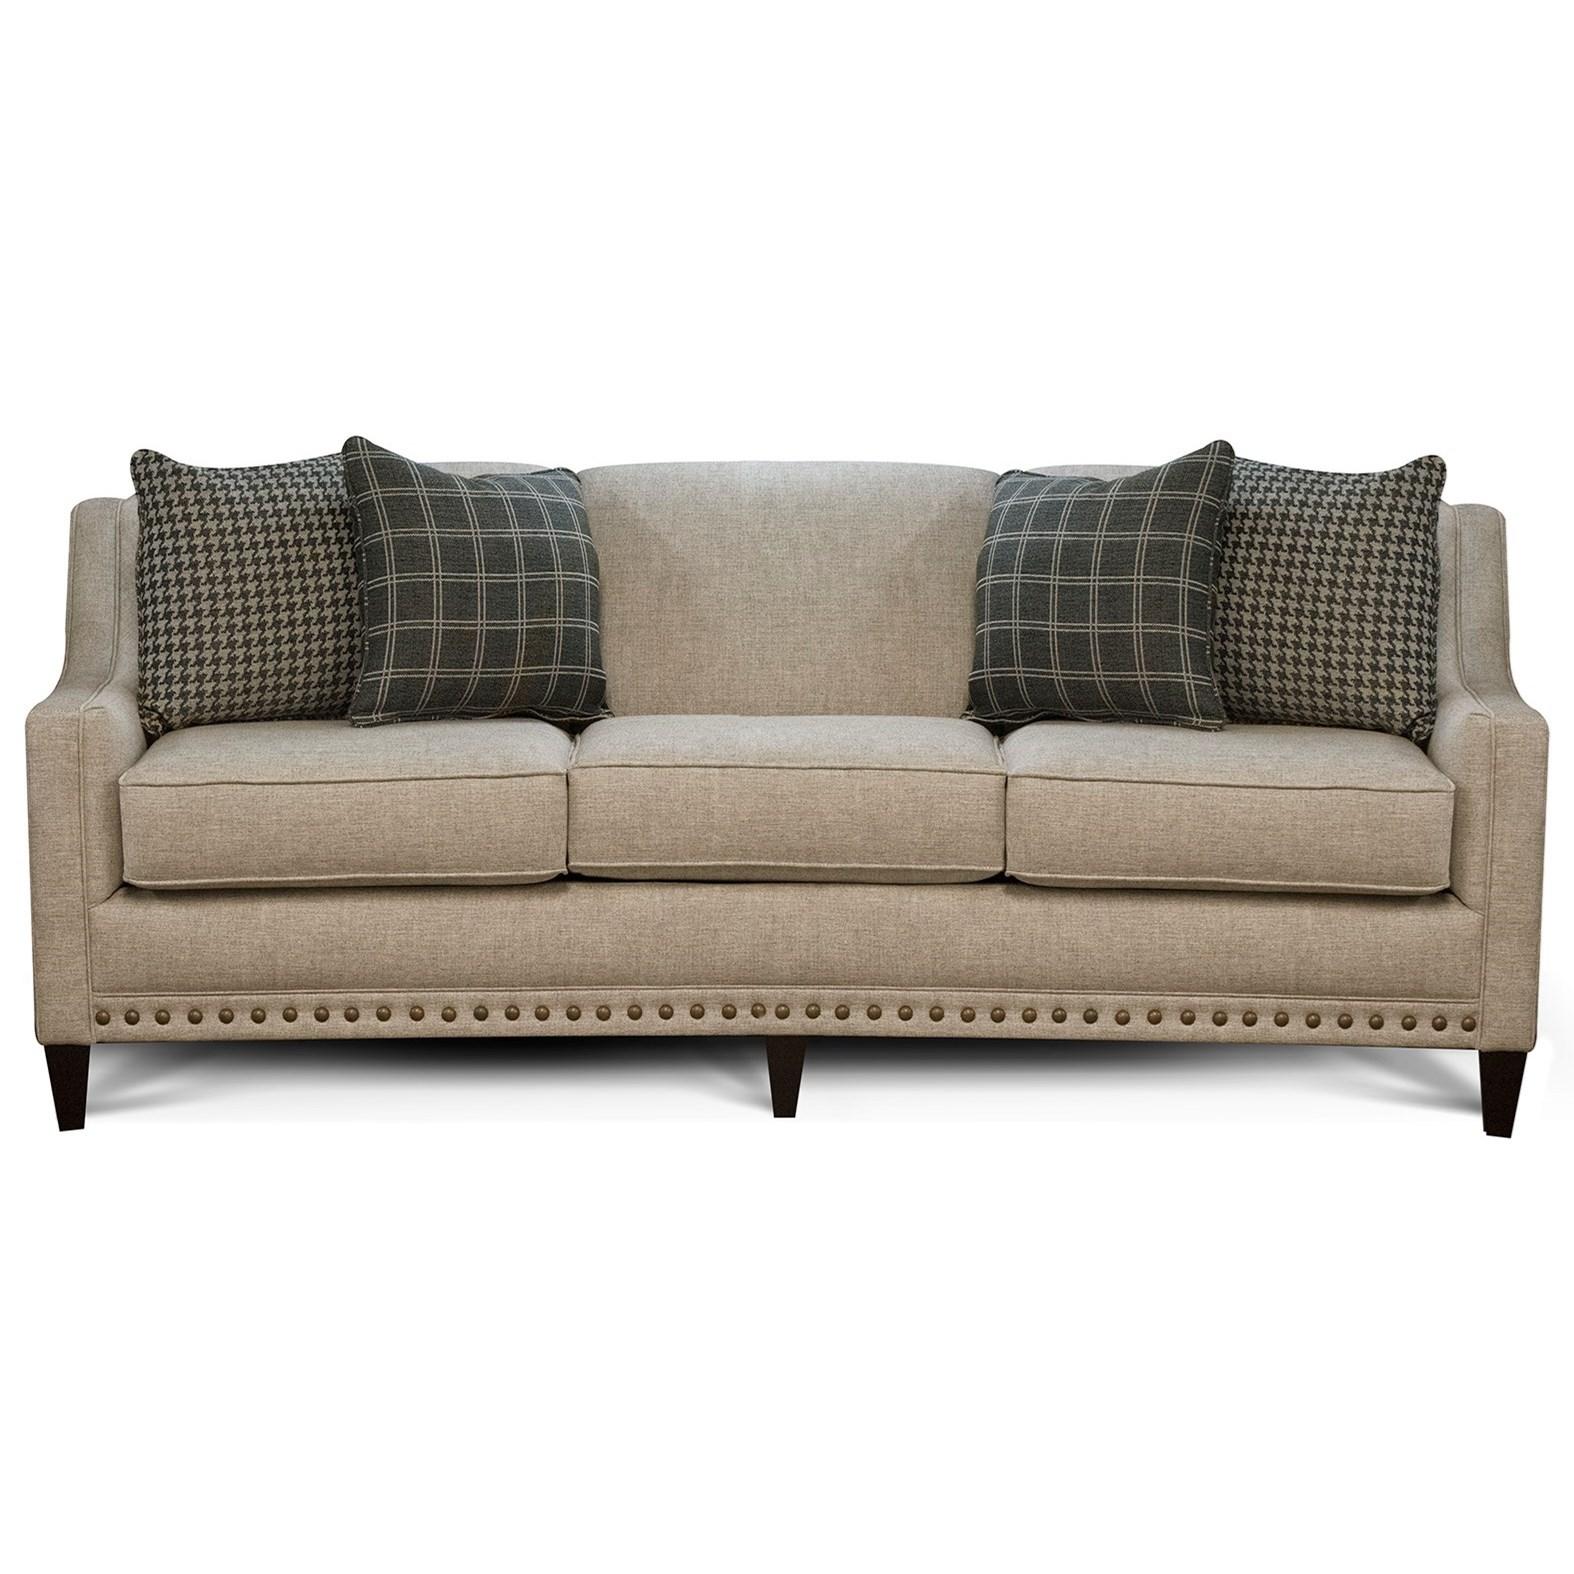 England Meredith Transitional Sofa With Nailhead Trim